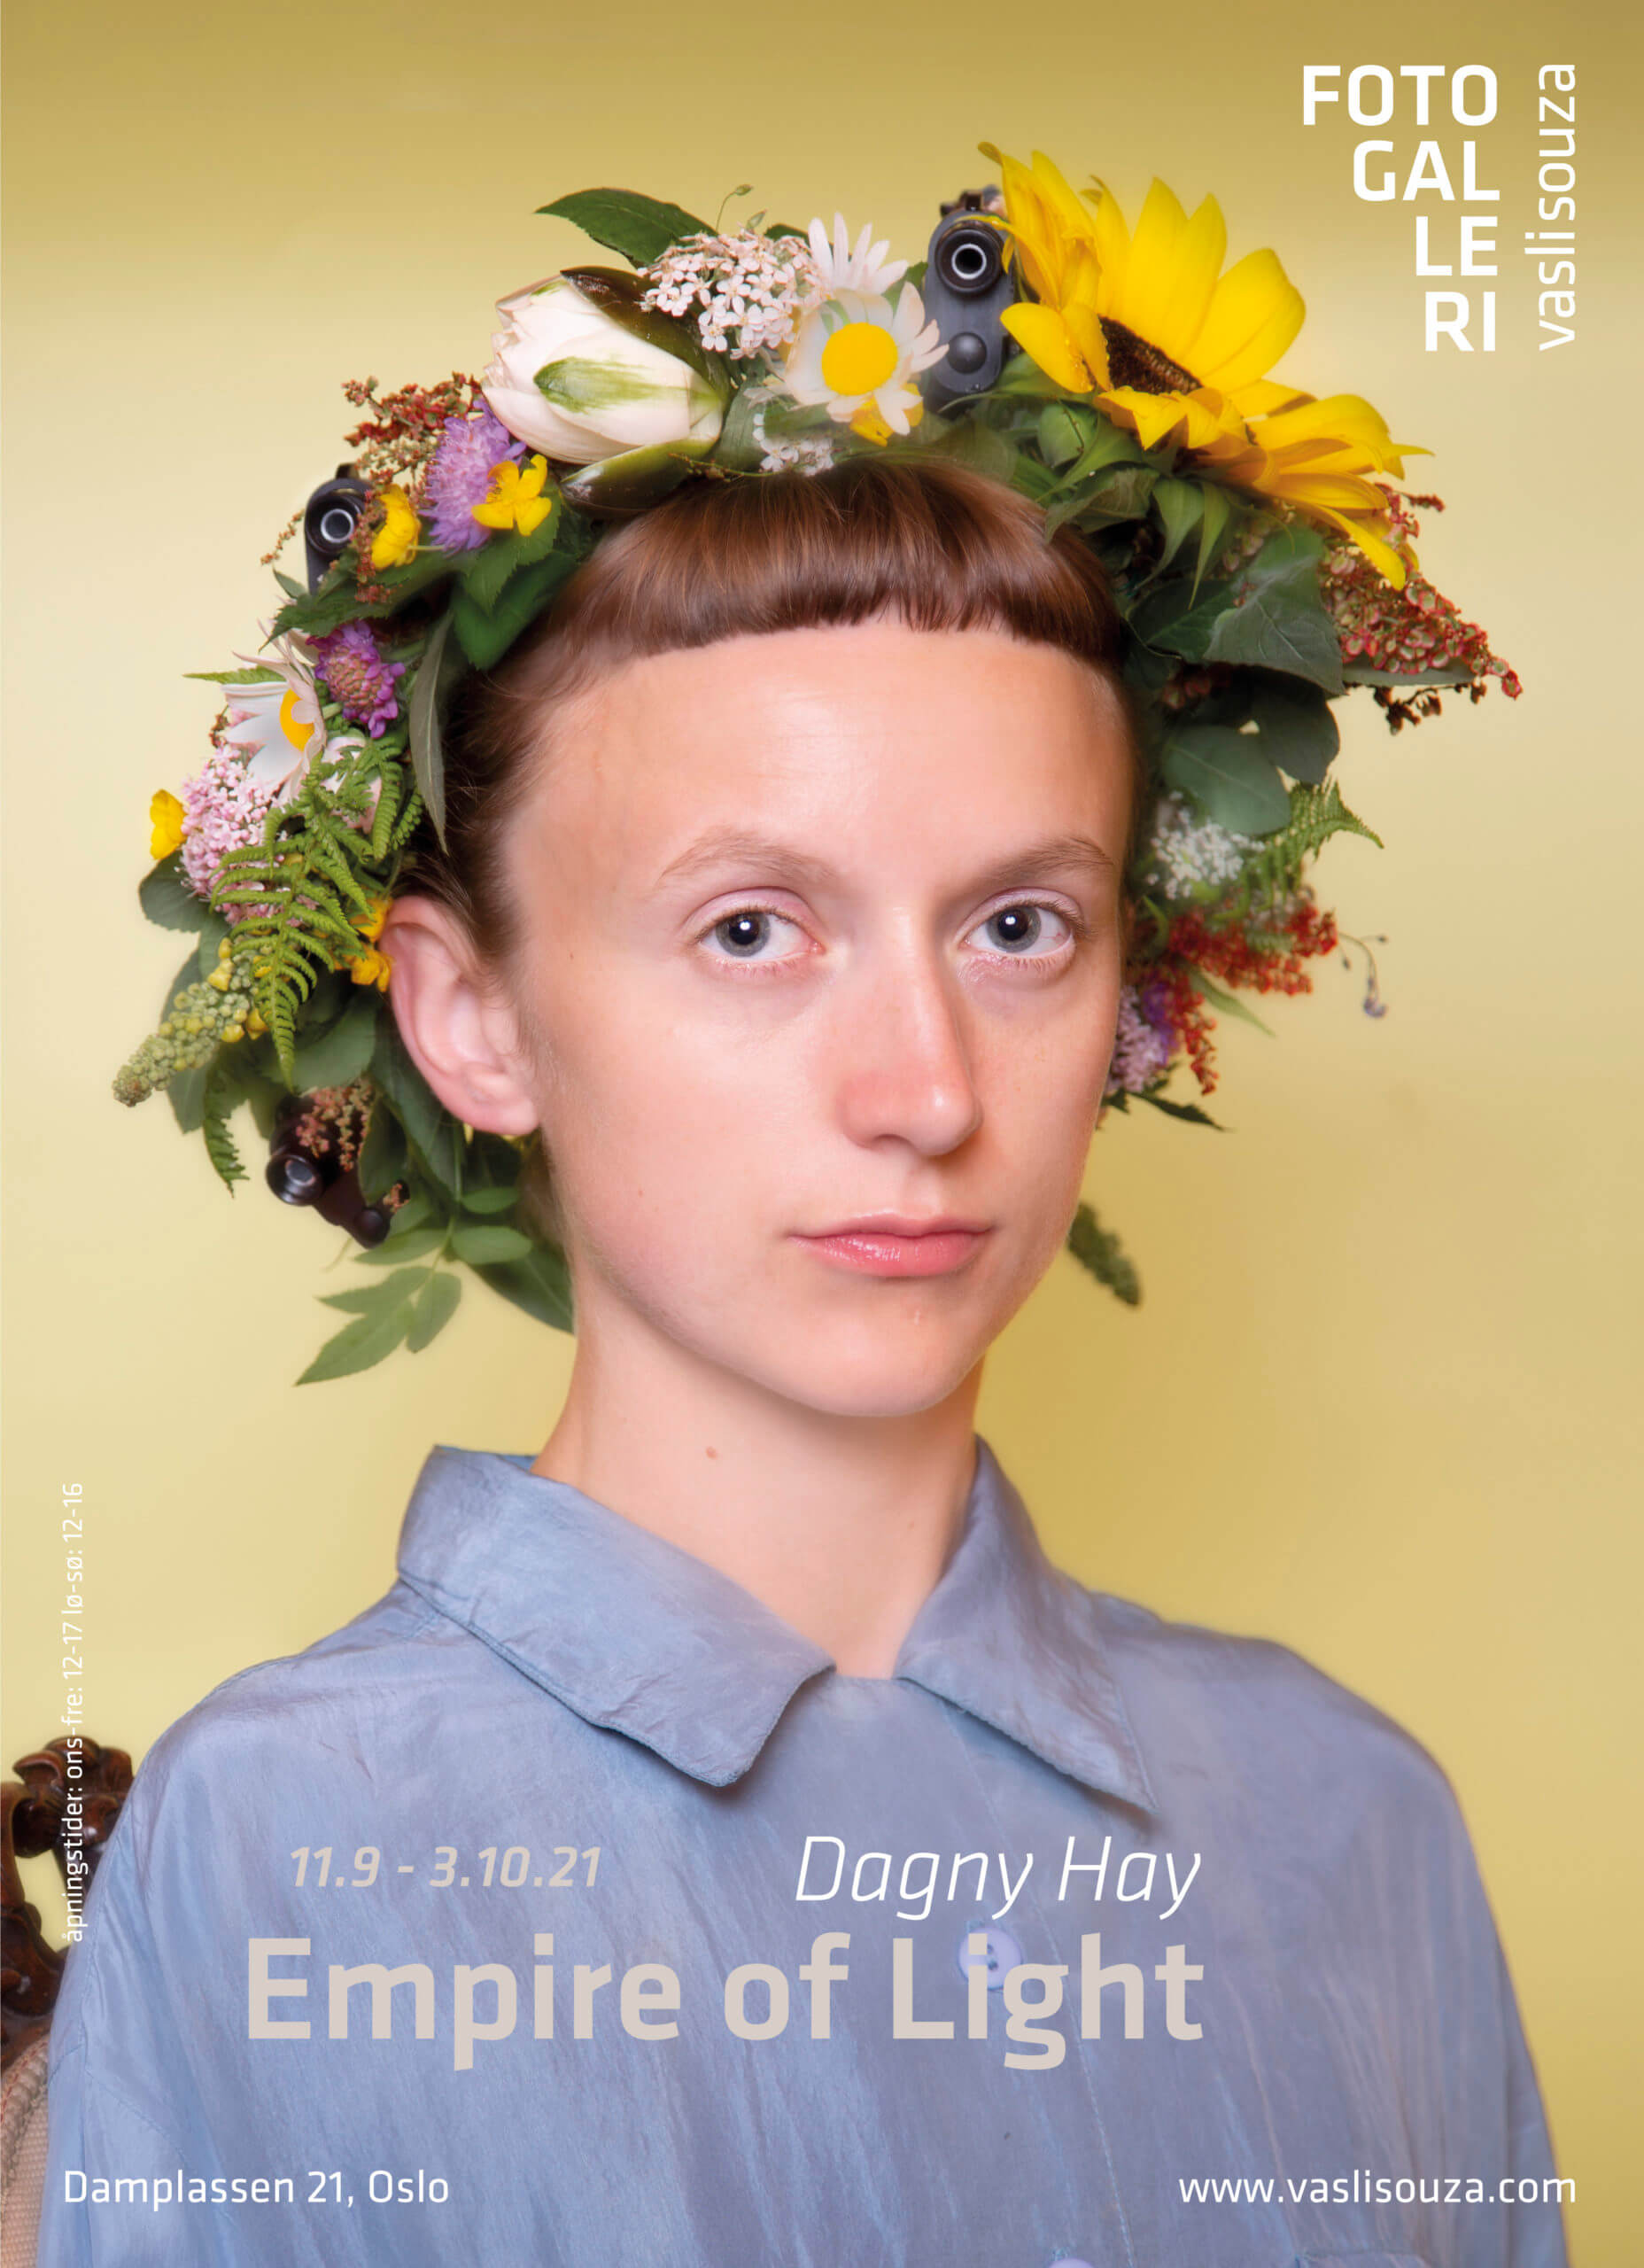 dagnyHay-100x138cm-poster-v1